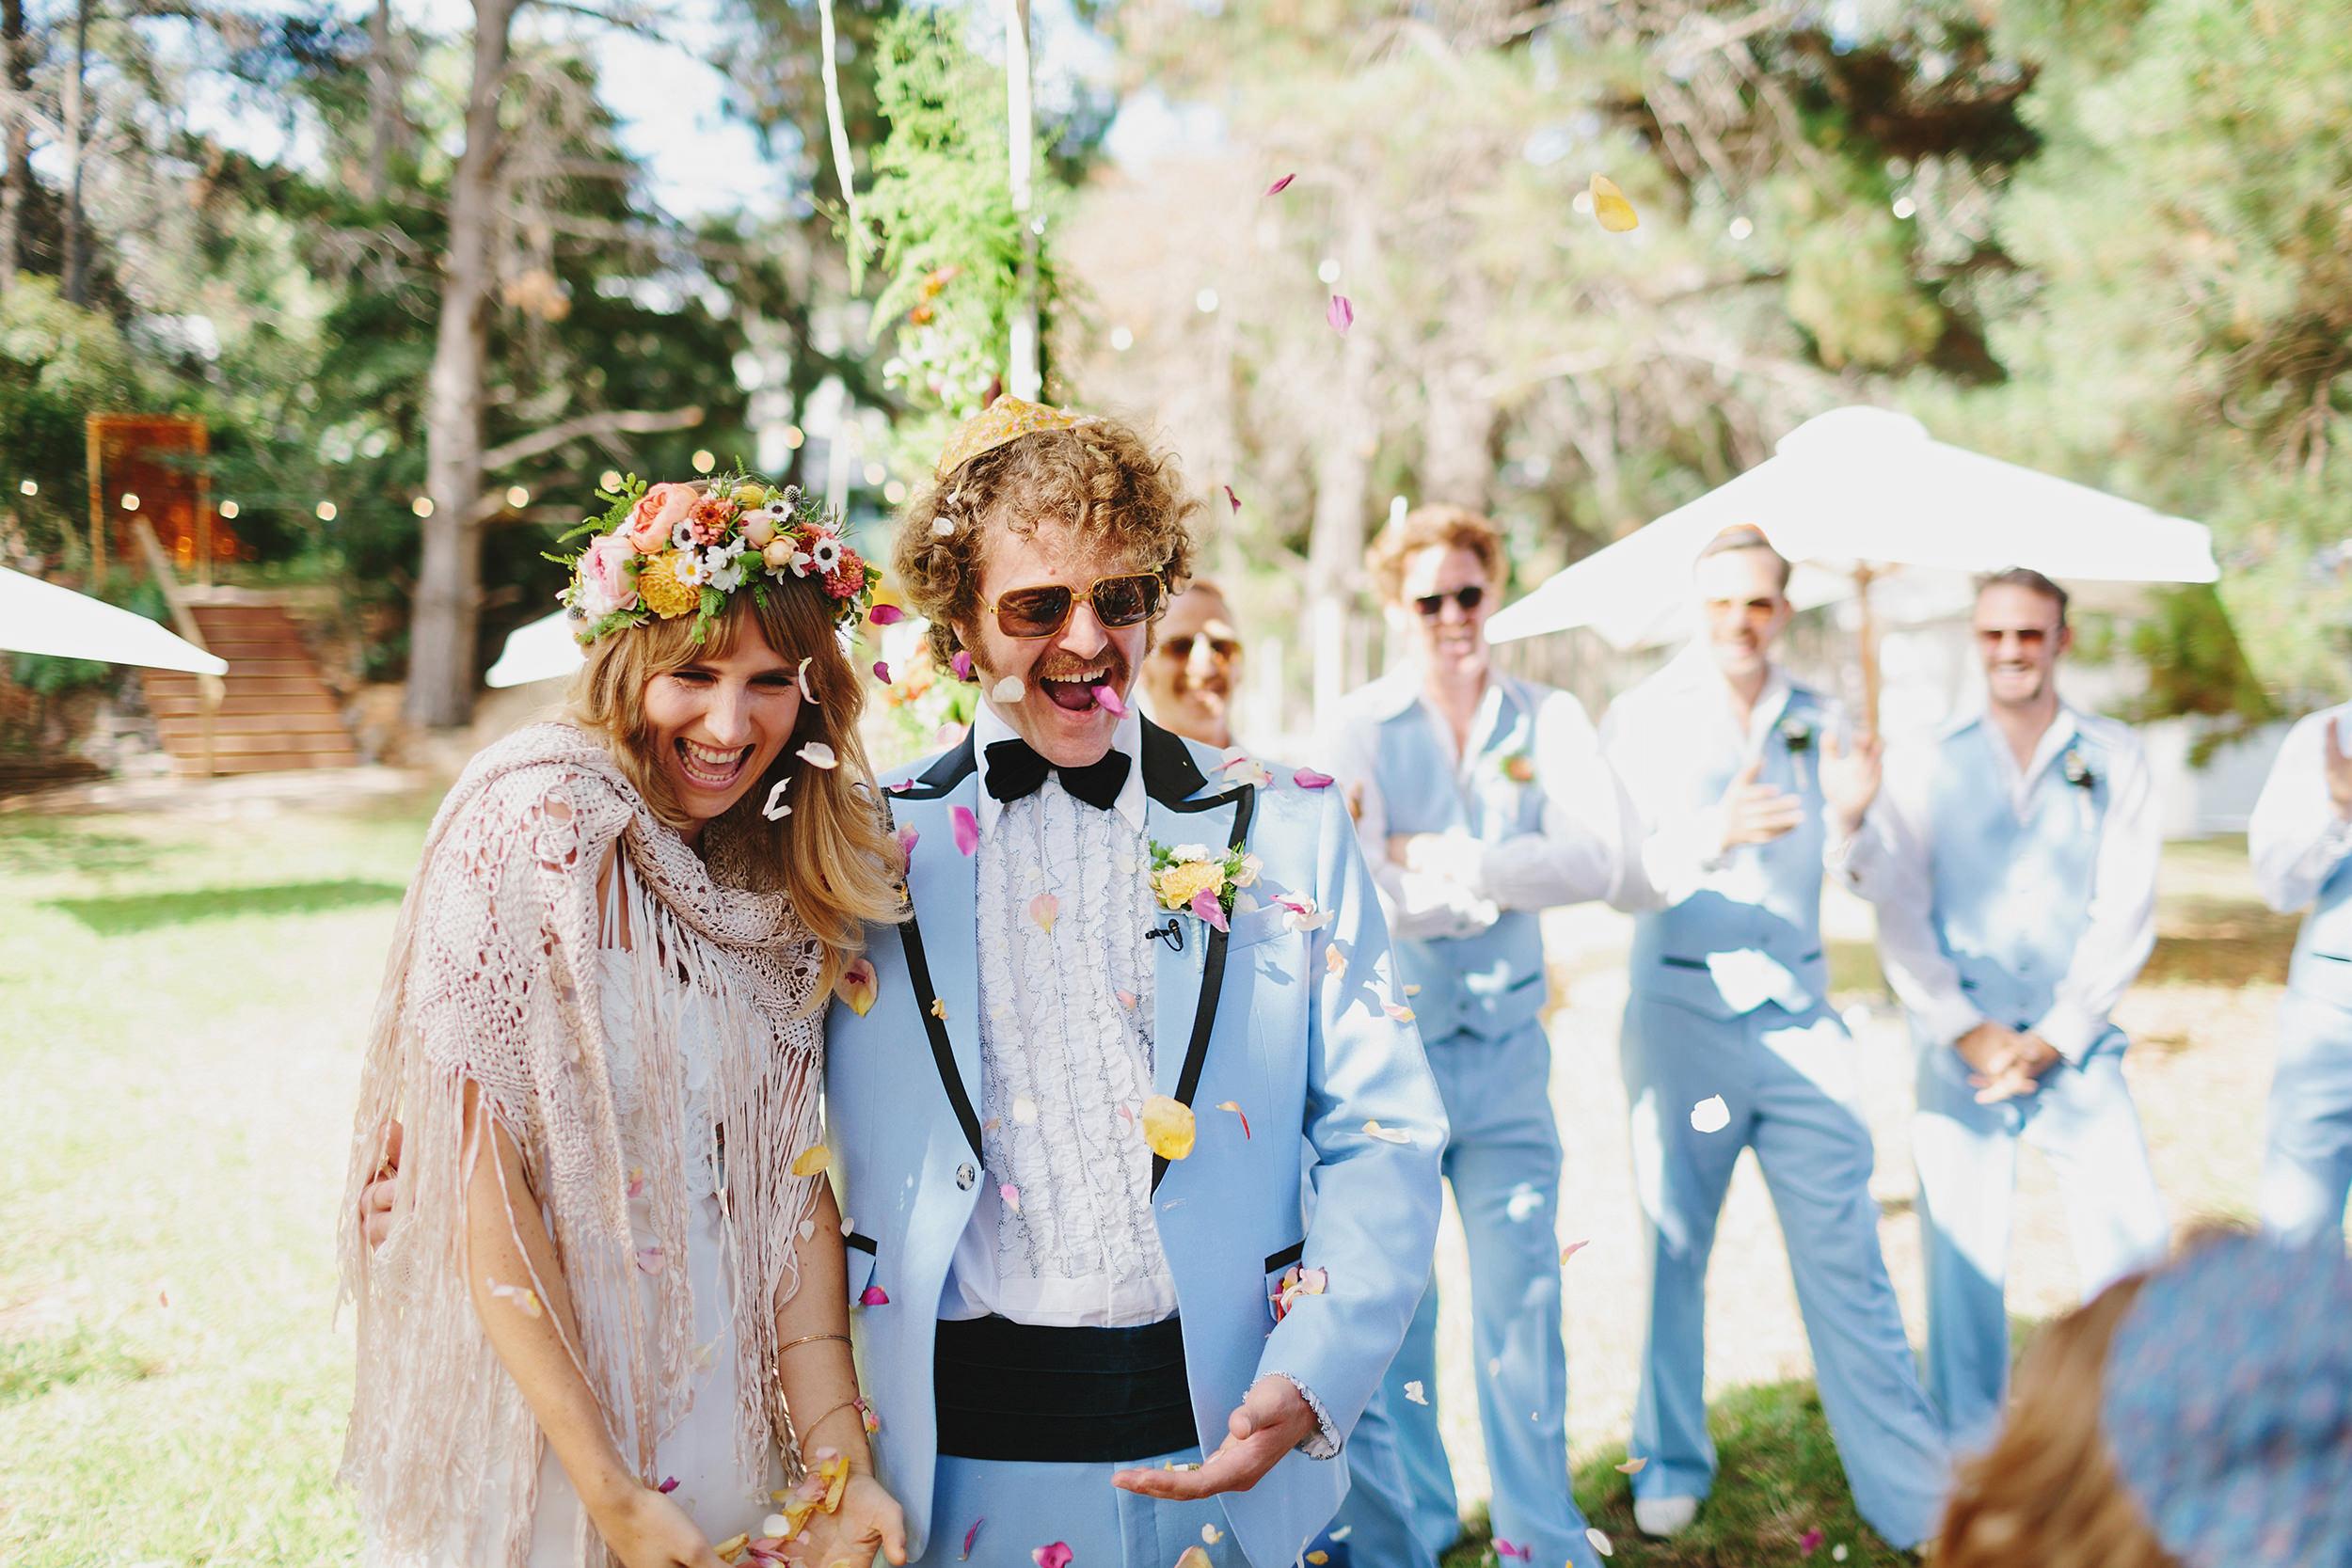 Melbourne_Vintage_Backyard_Wedding_Ben_Erin 041.JPG